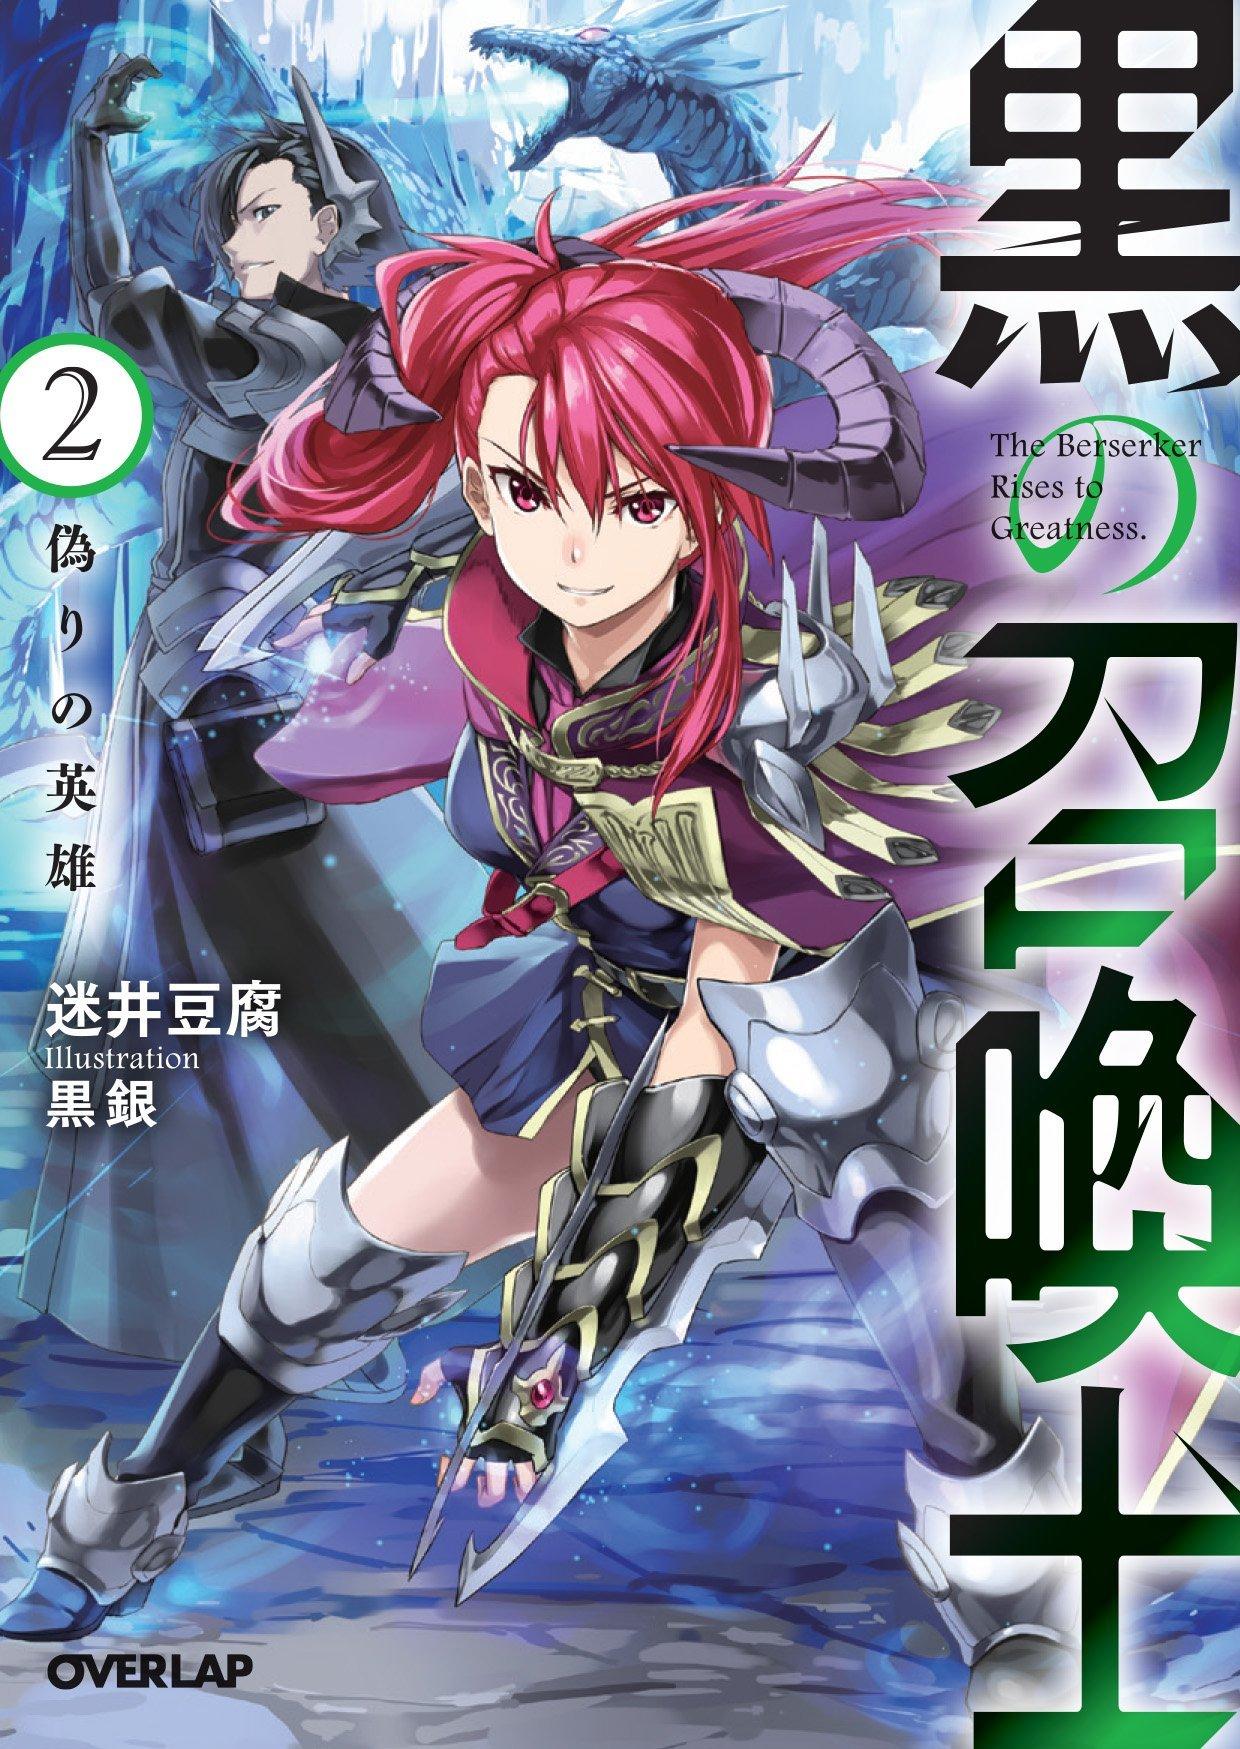 https://c10.mangatag.com/es_manga/pic5/50/25202/772852/5405a1d22f0357aa8038e6ec0c8e69e0.jpg Page 1